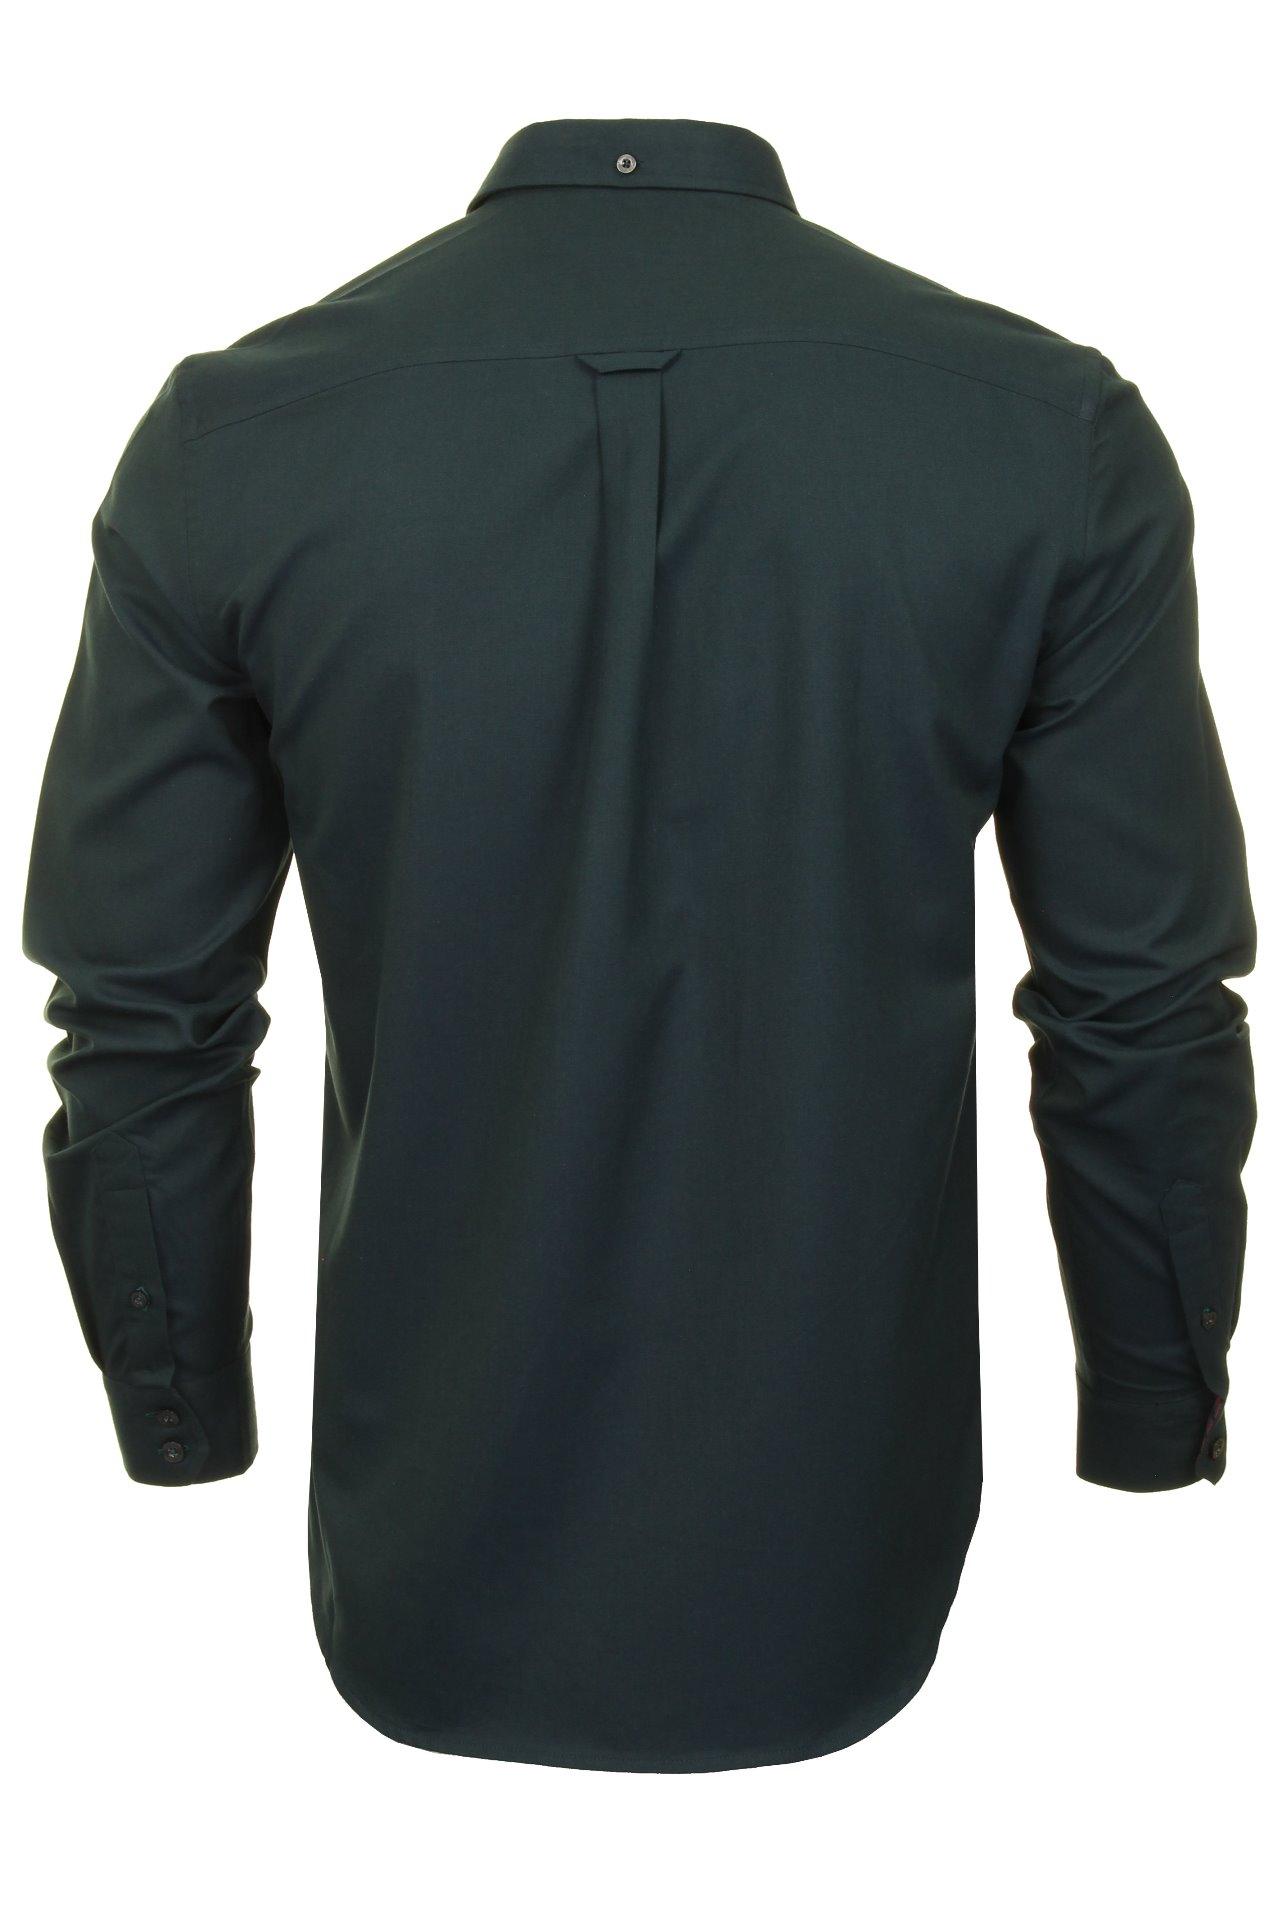 Mens-Oxford-Shirt-by-Ben-Sherman-Long-Sleeved miniatuur 25